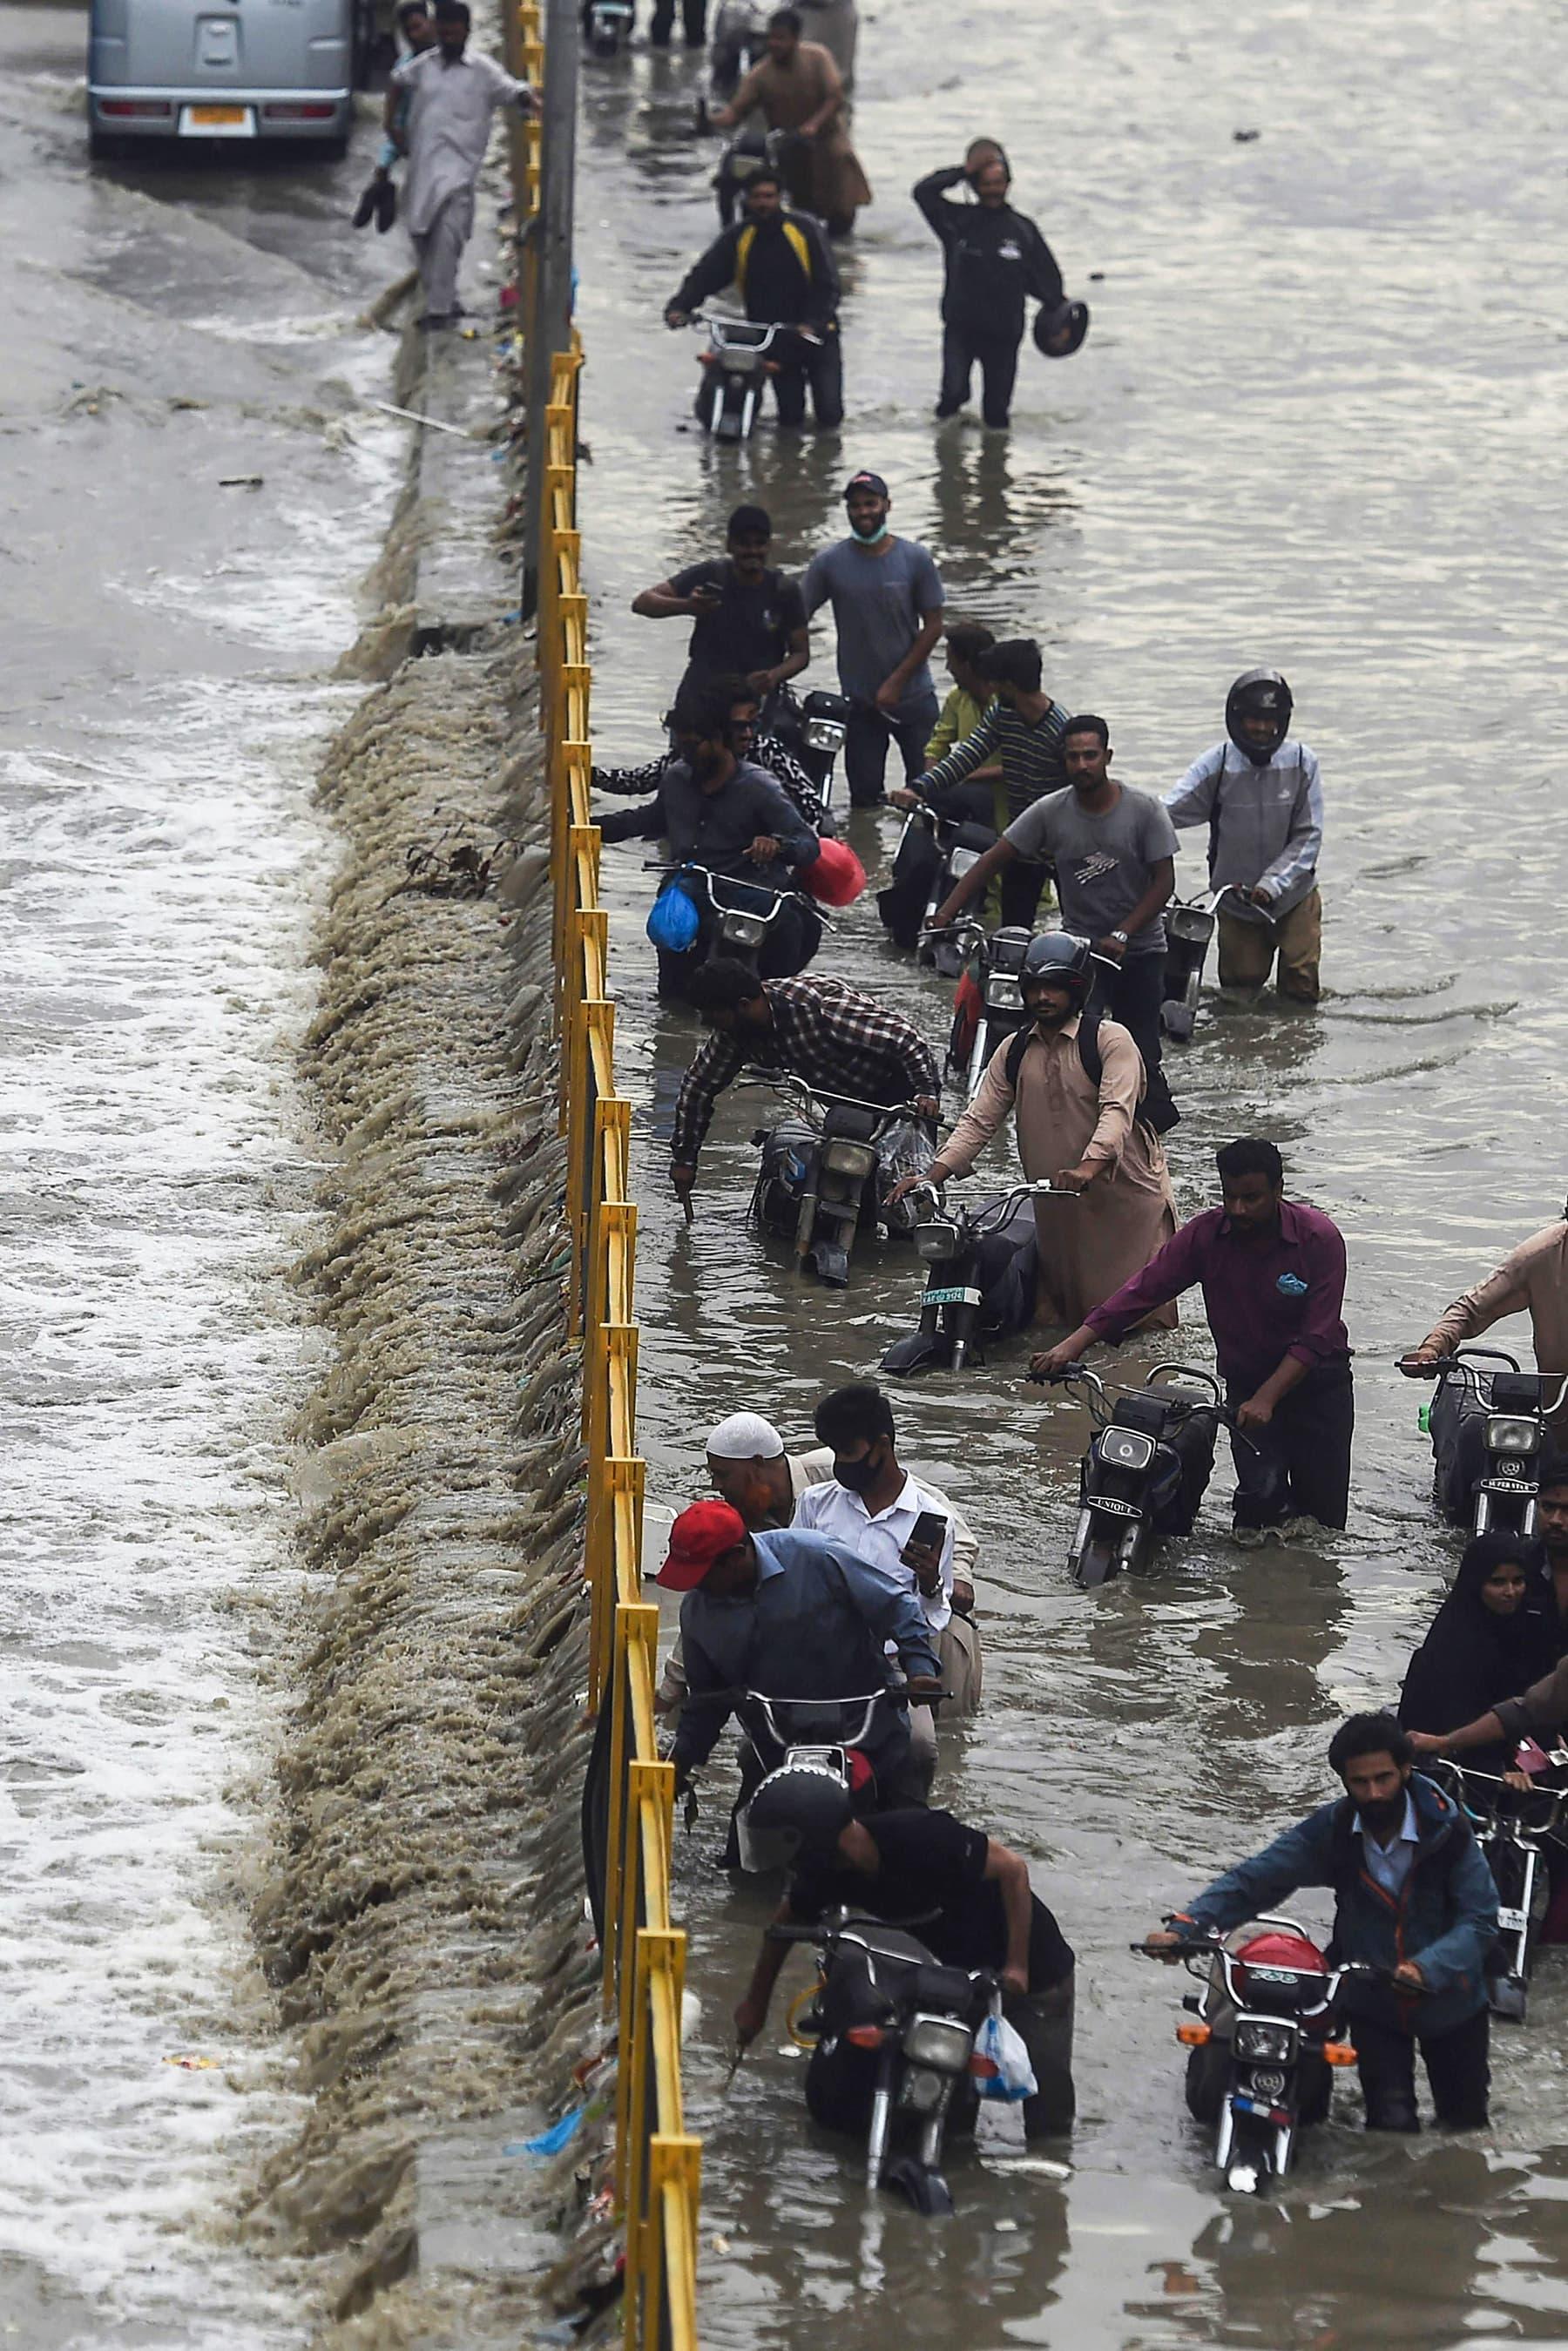 Commuters cross a flooded street after heavy rainfall in Karachi on September 23. — AFP